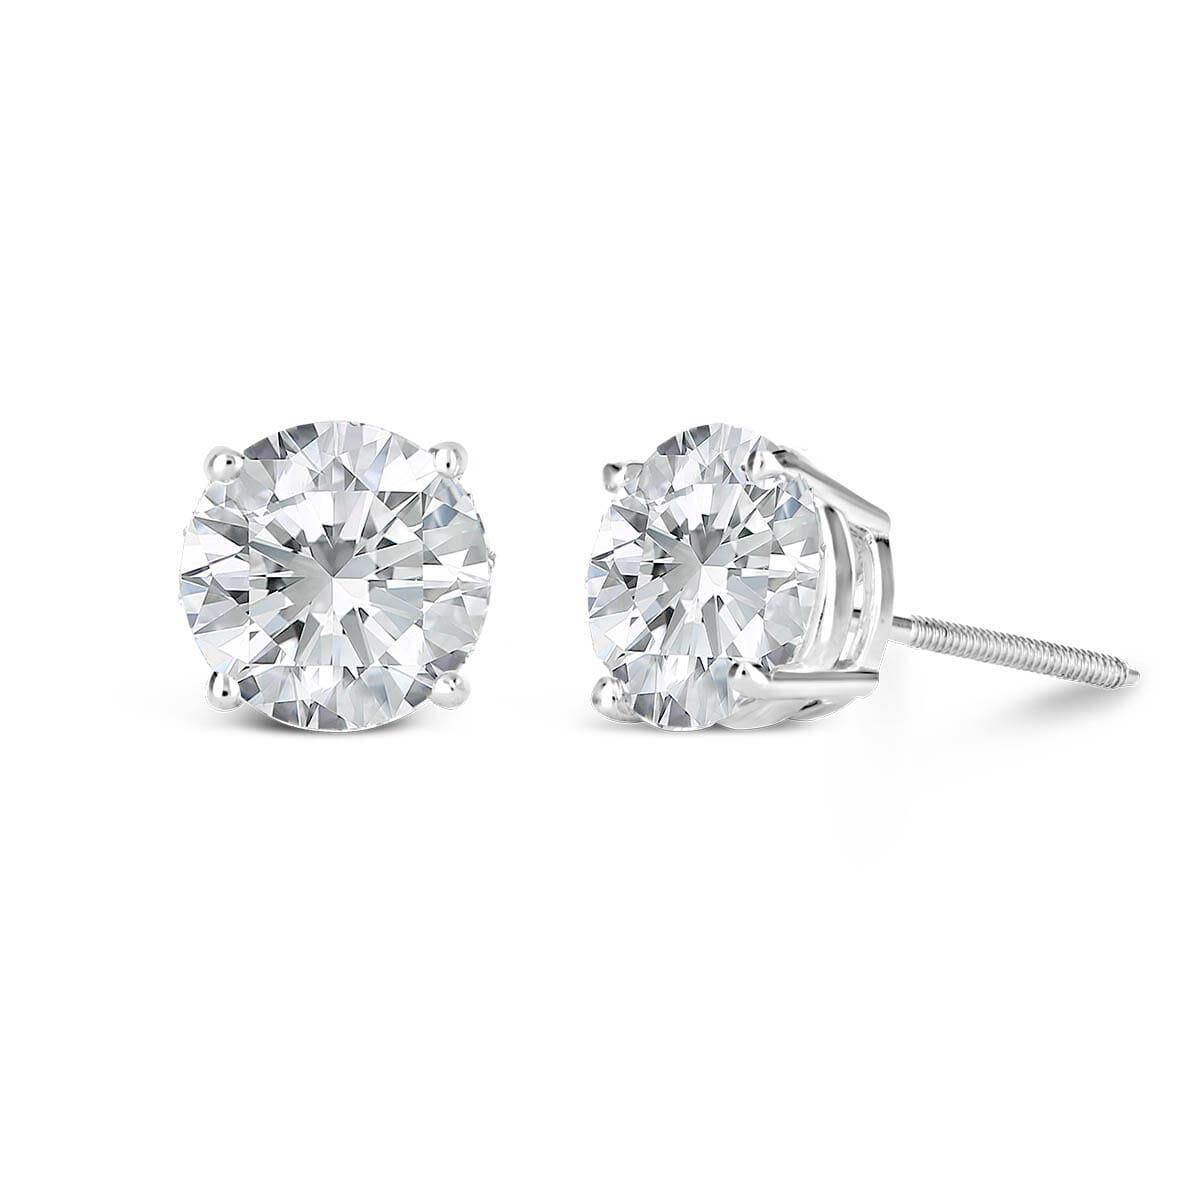 CDB5 Fashion Individuality Men/'S Diamond Earrings Ear Stud Jewelry Gifts White